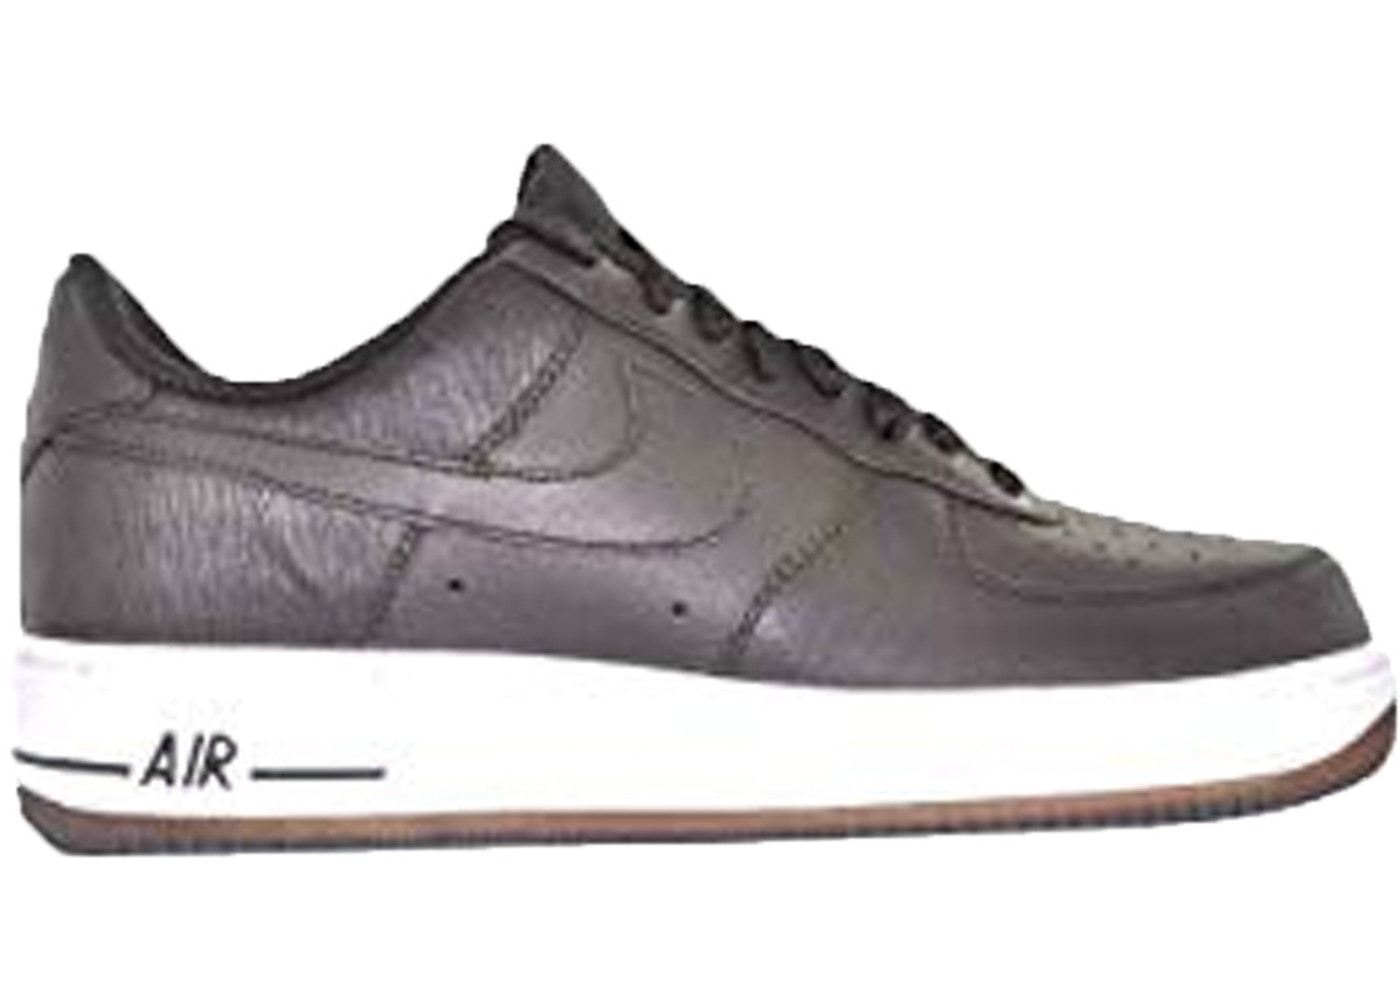 vacío Bergantín Drama  Nike Air Force 1 07 Velvet Brown White - 315122-202